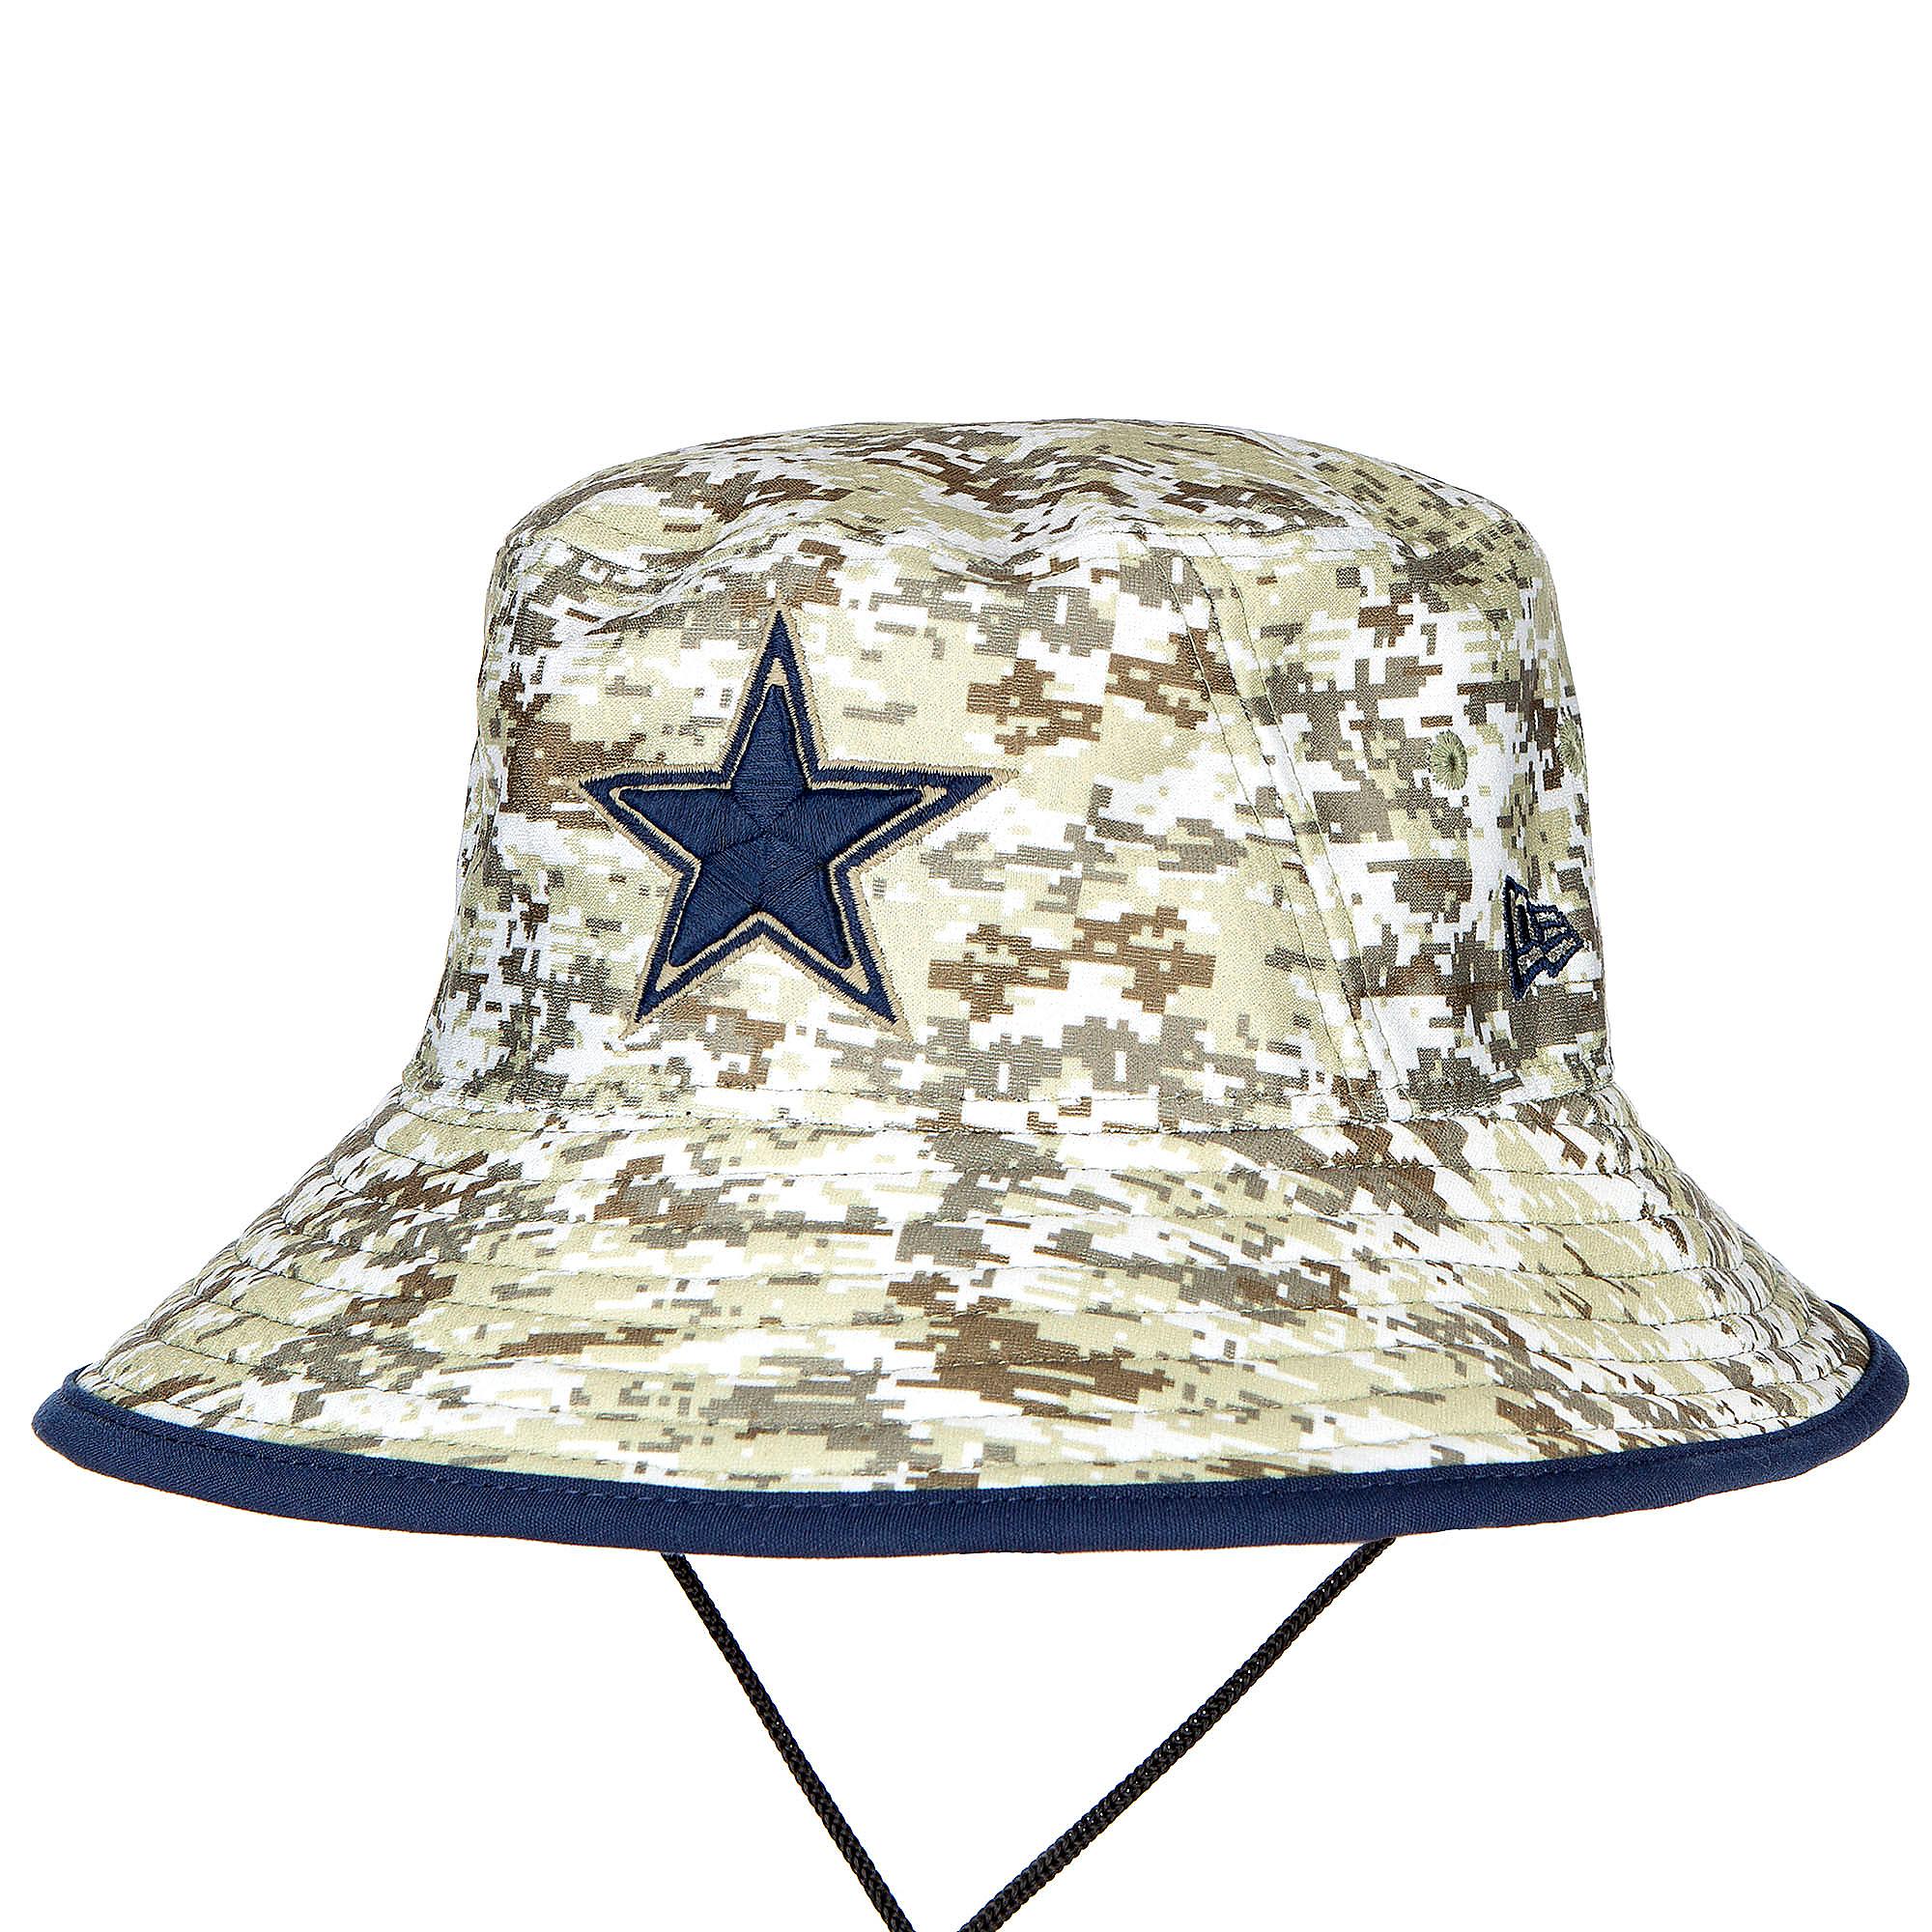 Dallas Cowboys New Era Salute to Service Digi Camo Bucket Hat